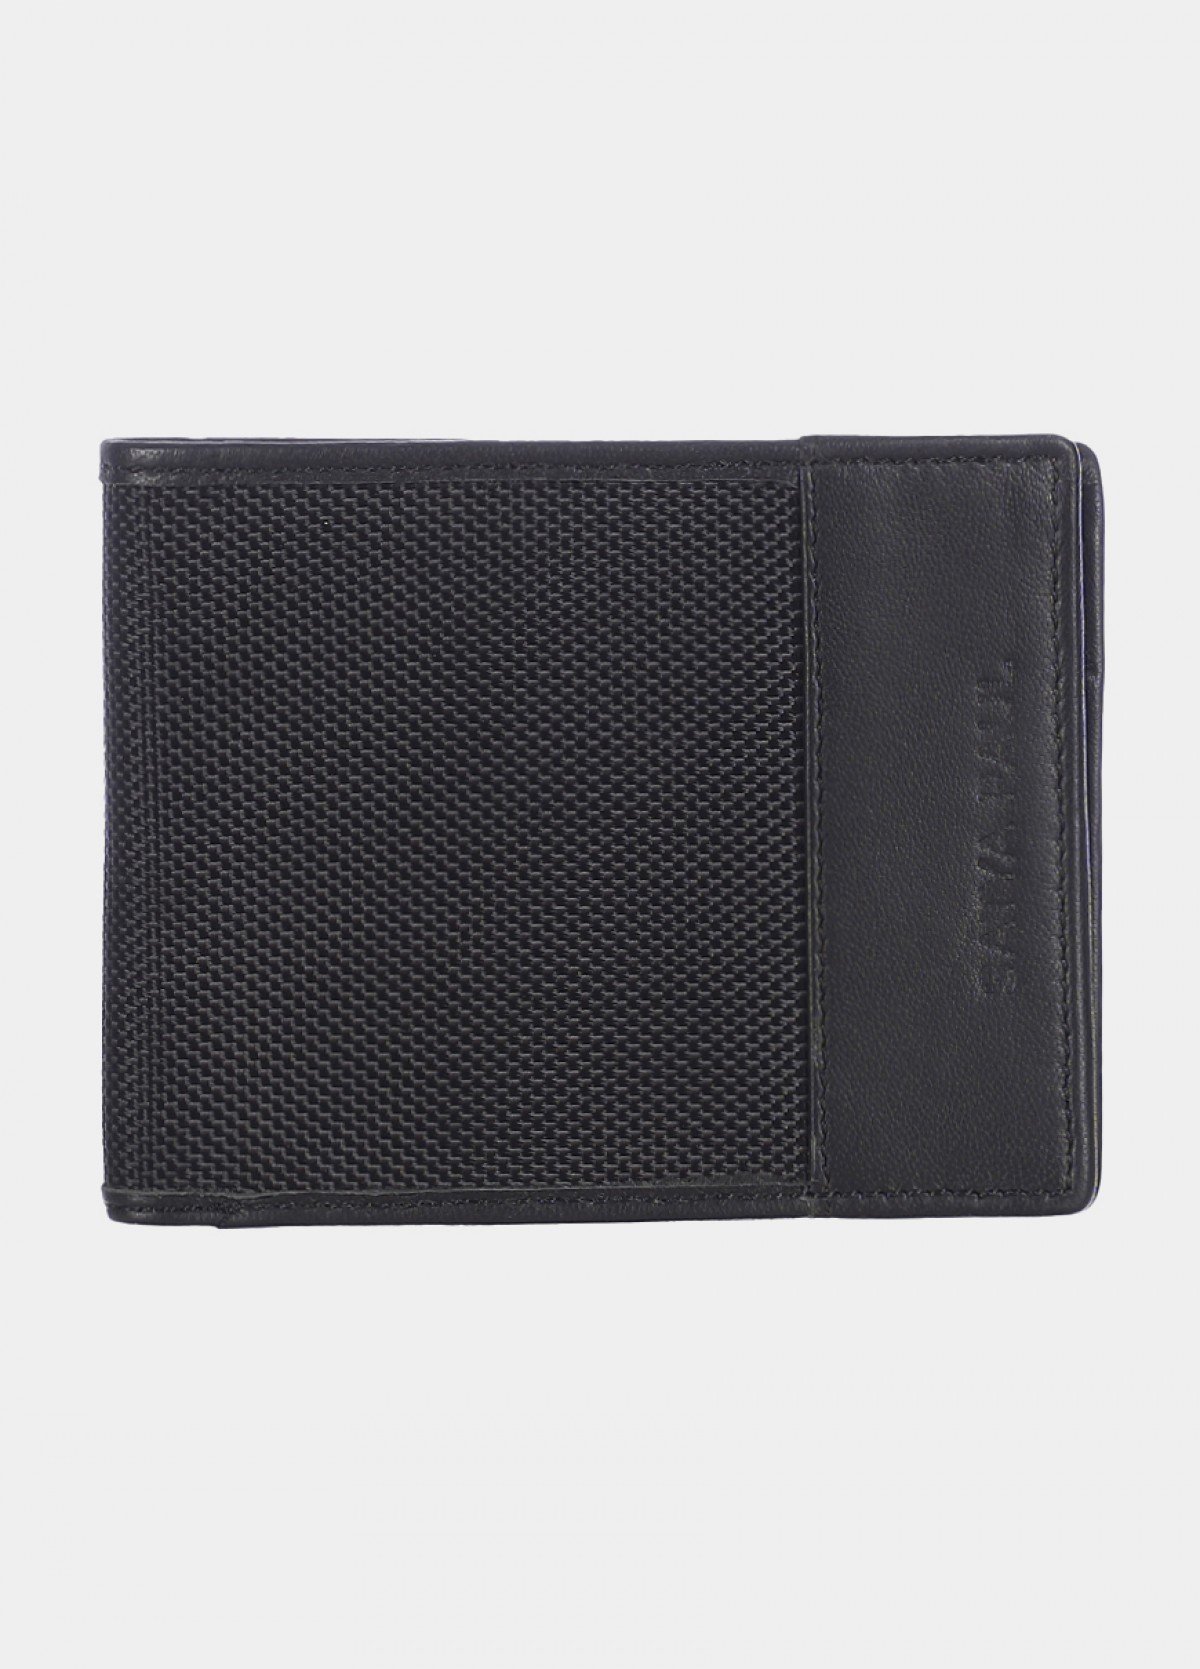 Him & The City Men'S Bi Fold Wallet With Coin Pocket Black